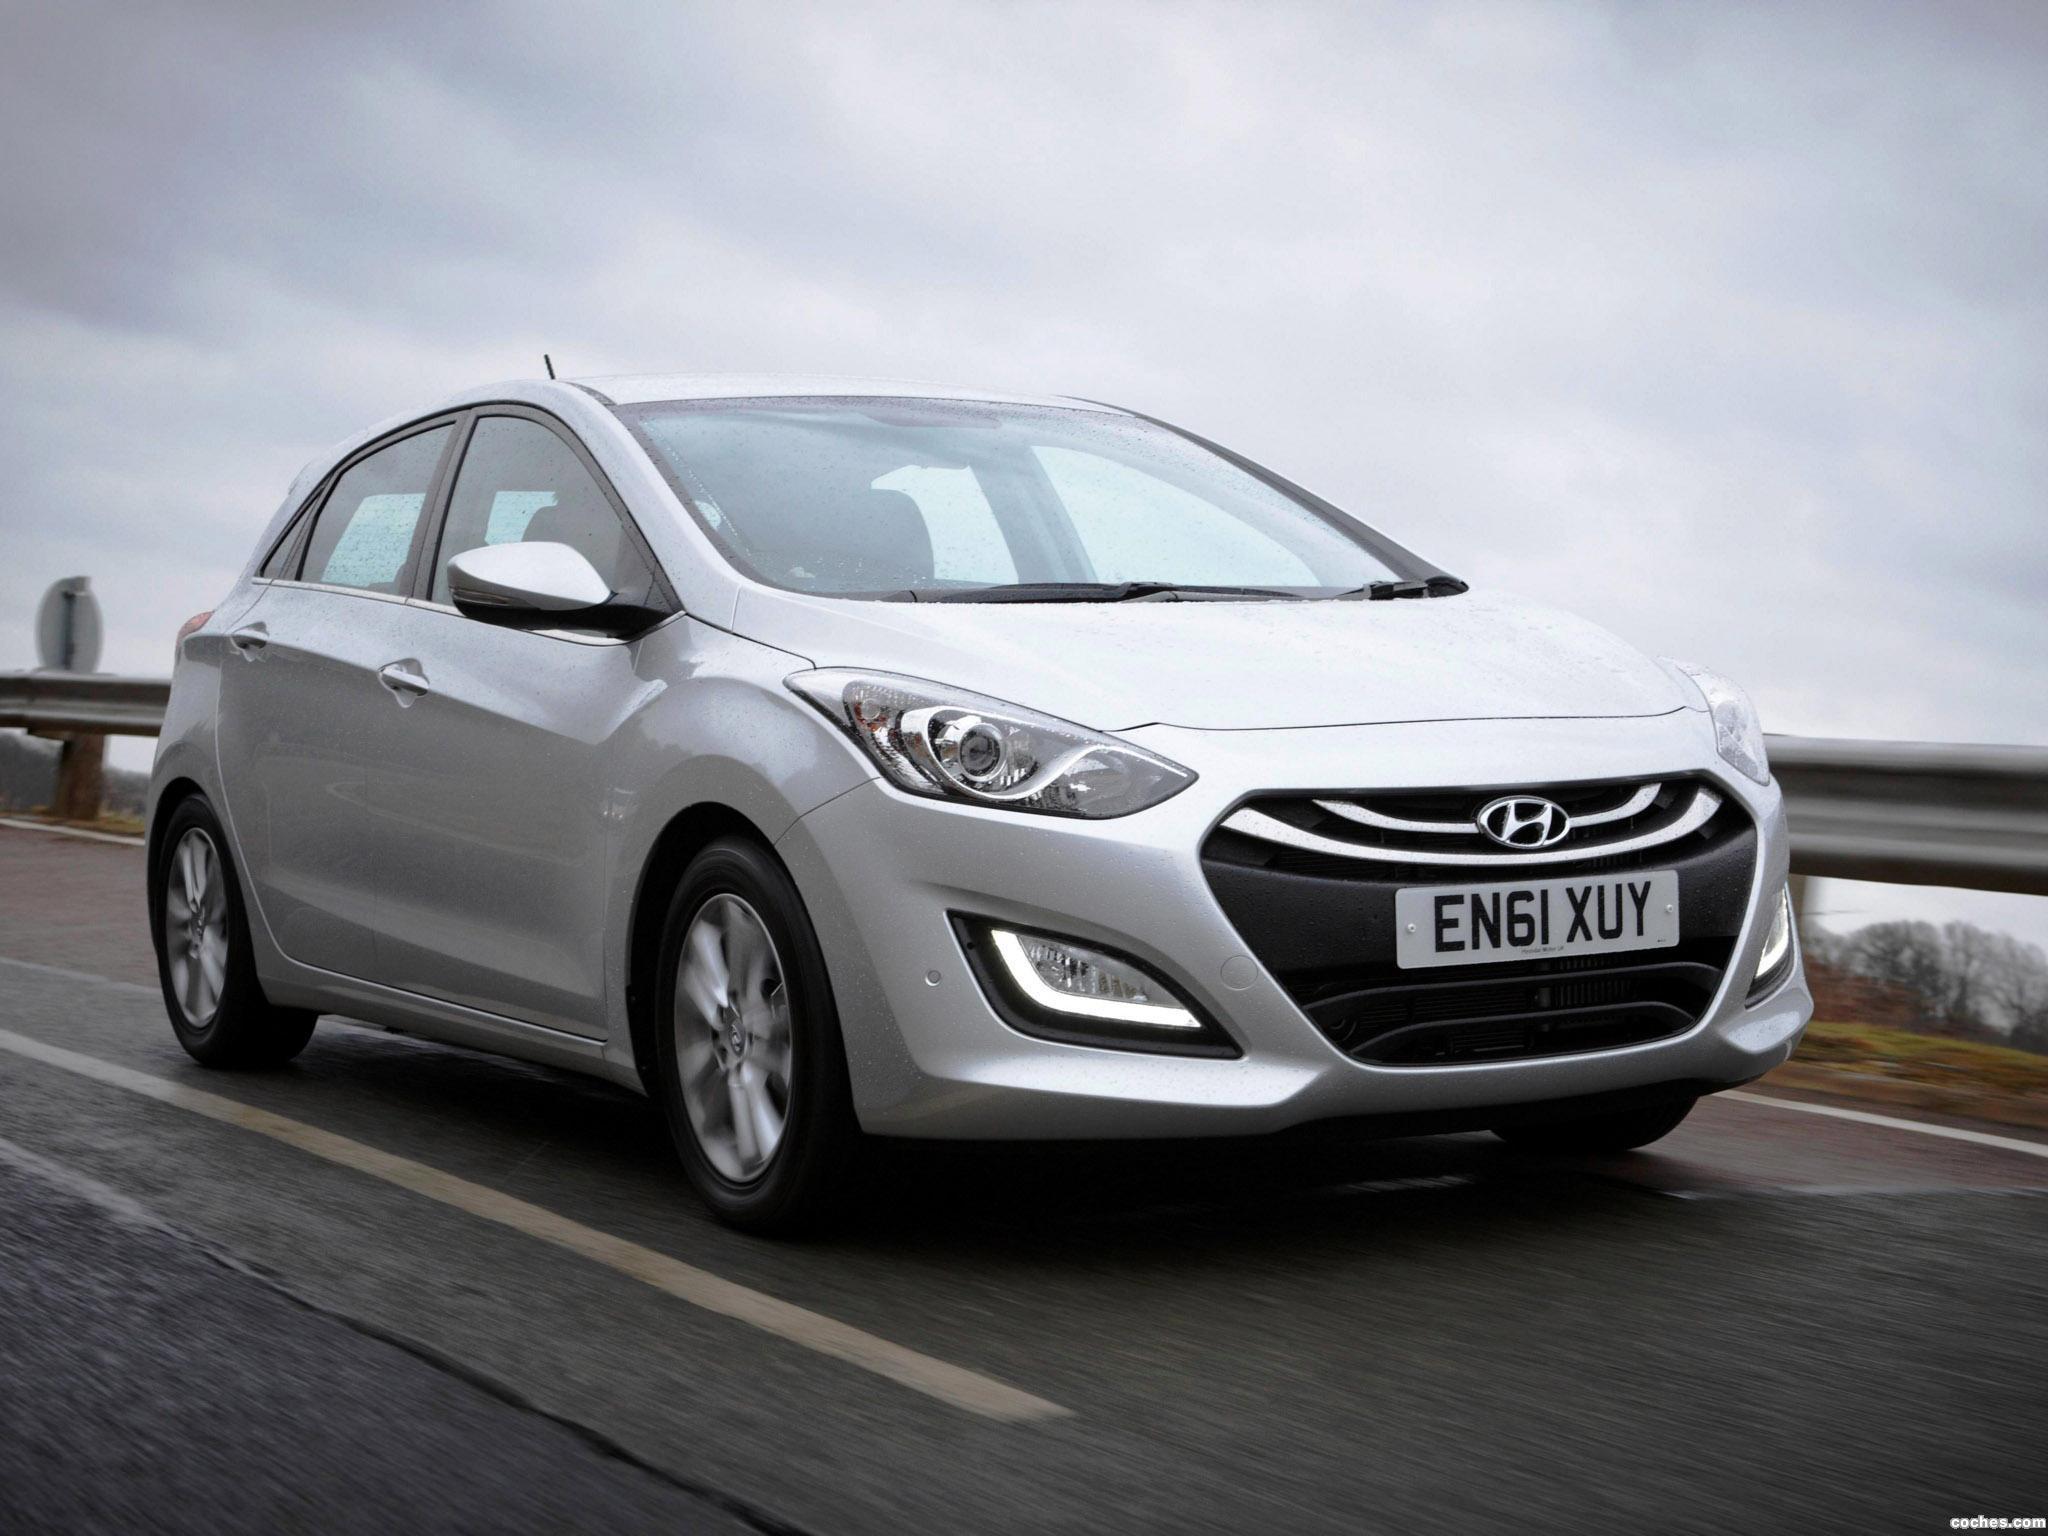 Foto 0 de Hyundai I30 UK 2012 5 puertas